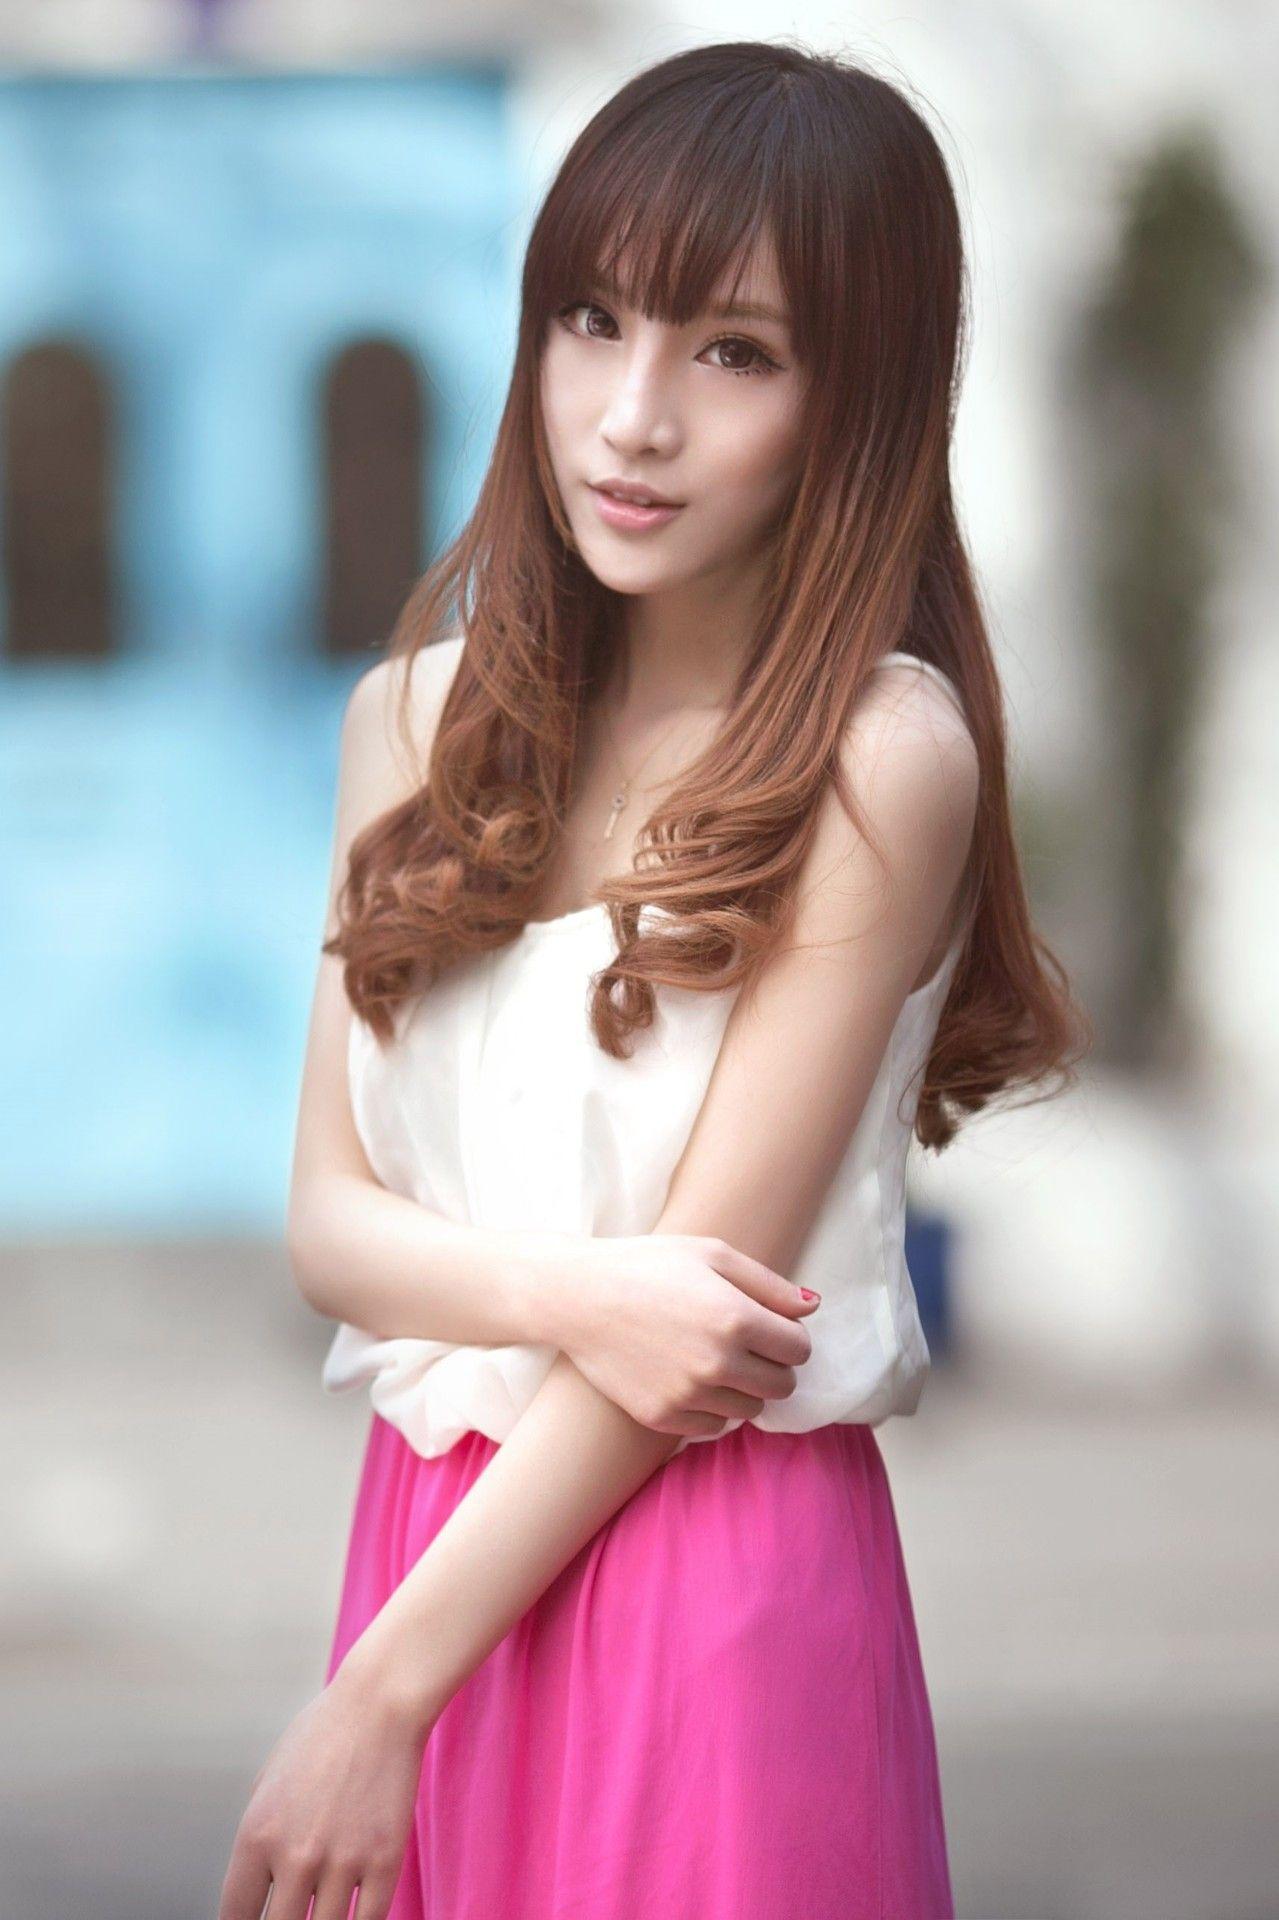 jupe rose